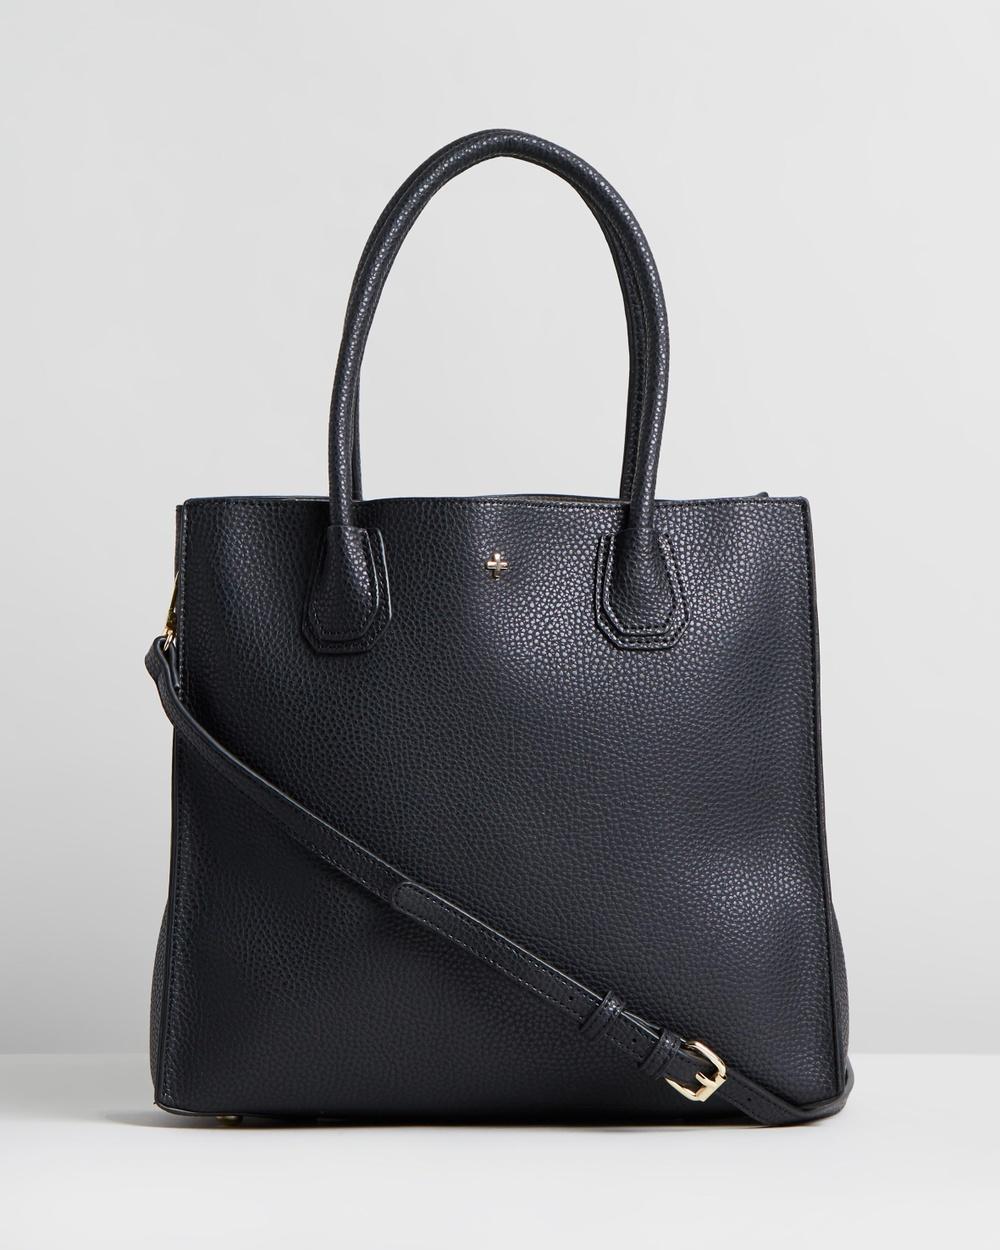 PETA AND JAIN Holly Tote Bag Handbags Black